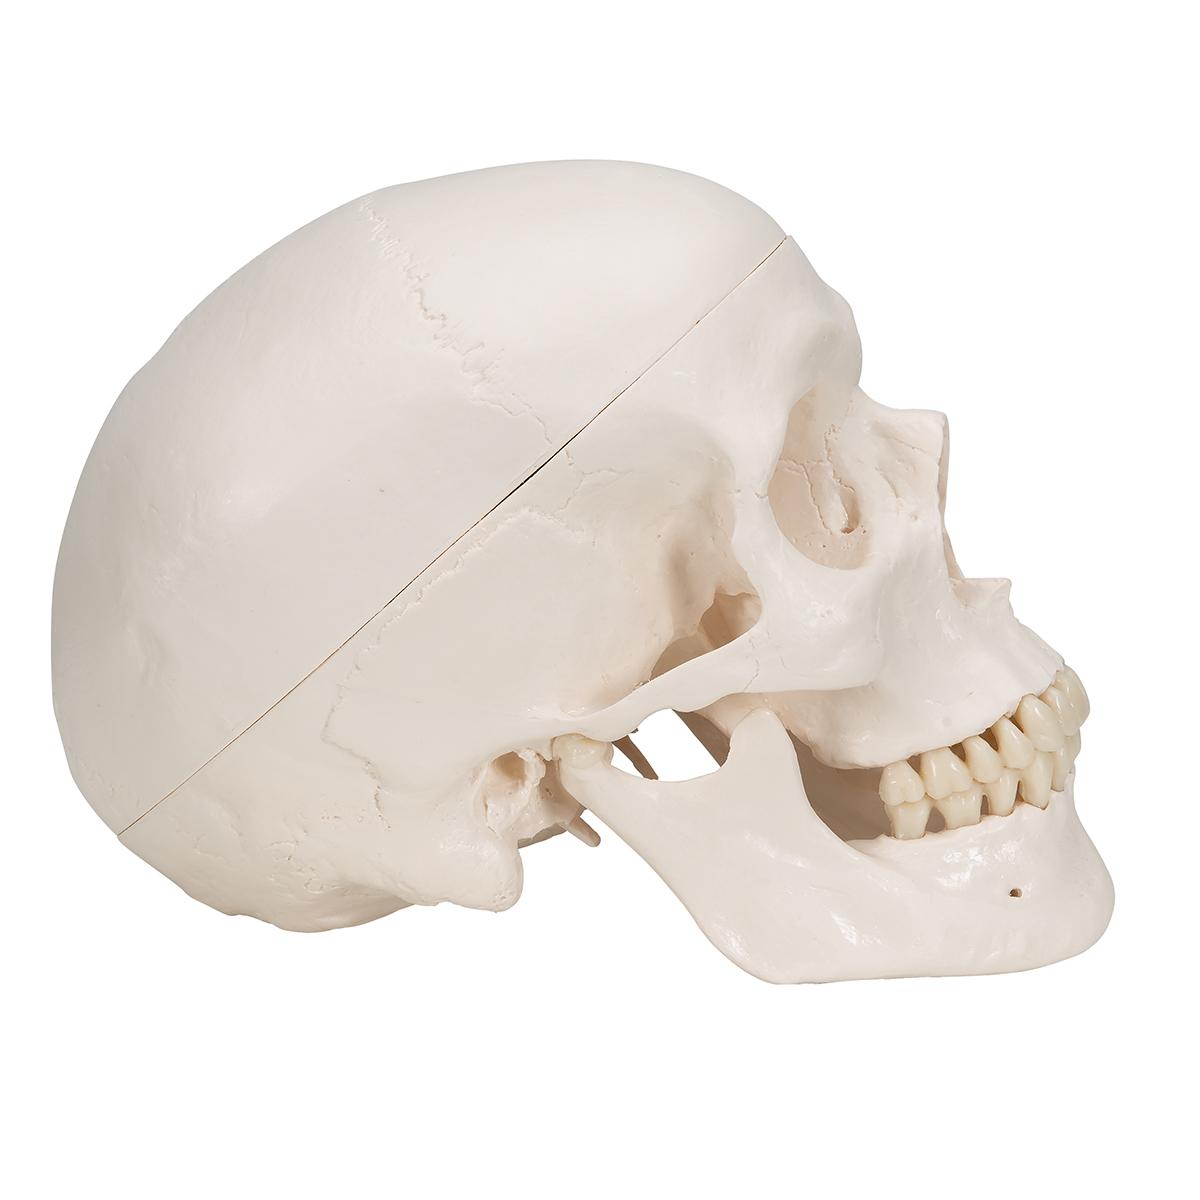 Klassik-Schädel mit Gehirn, 8-teilig - 1020162 - A20/9 ...